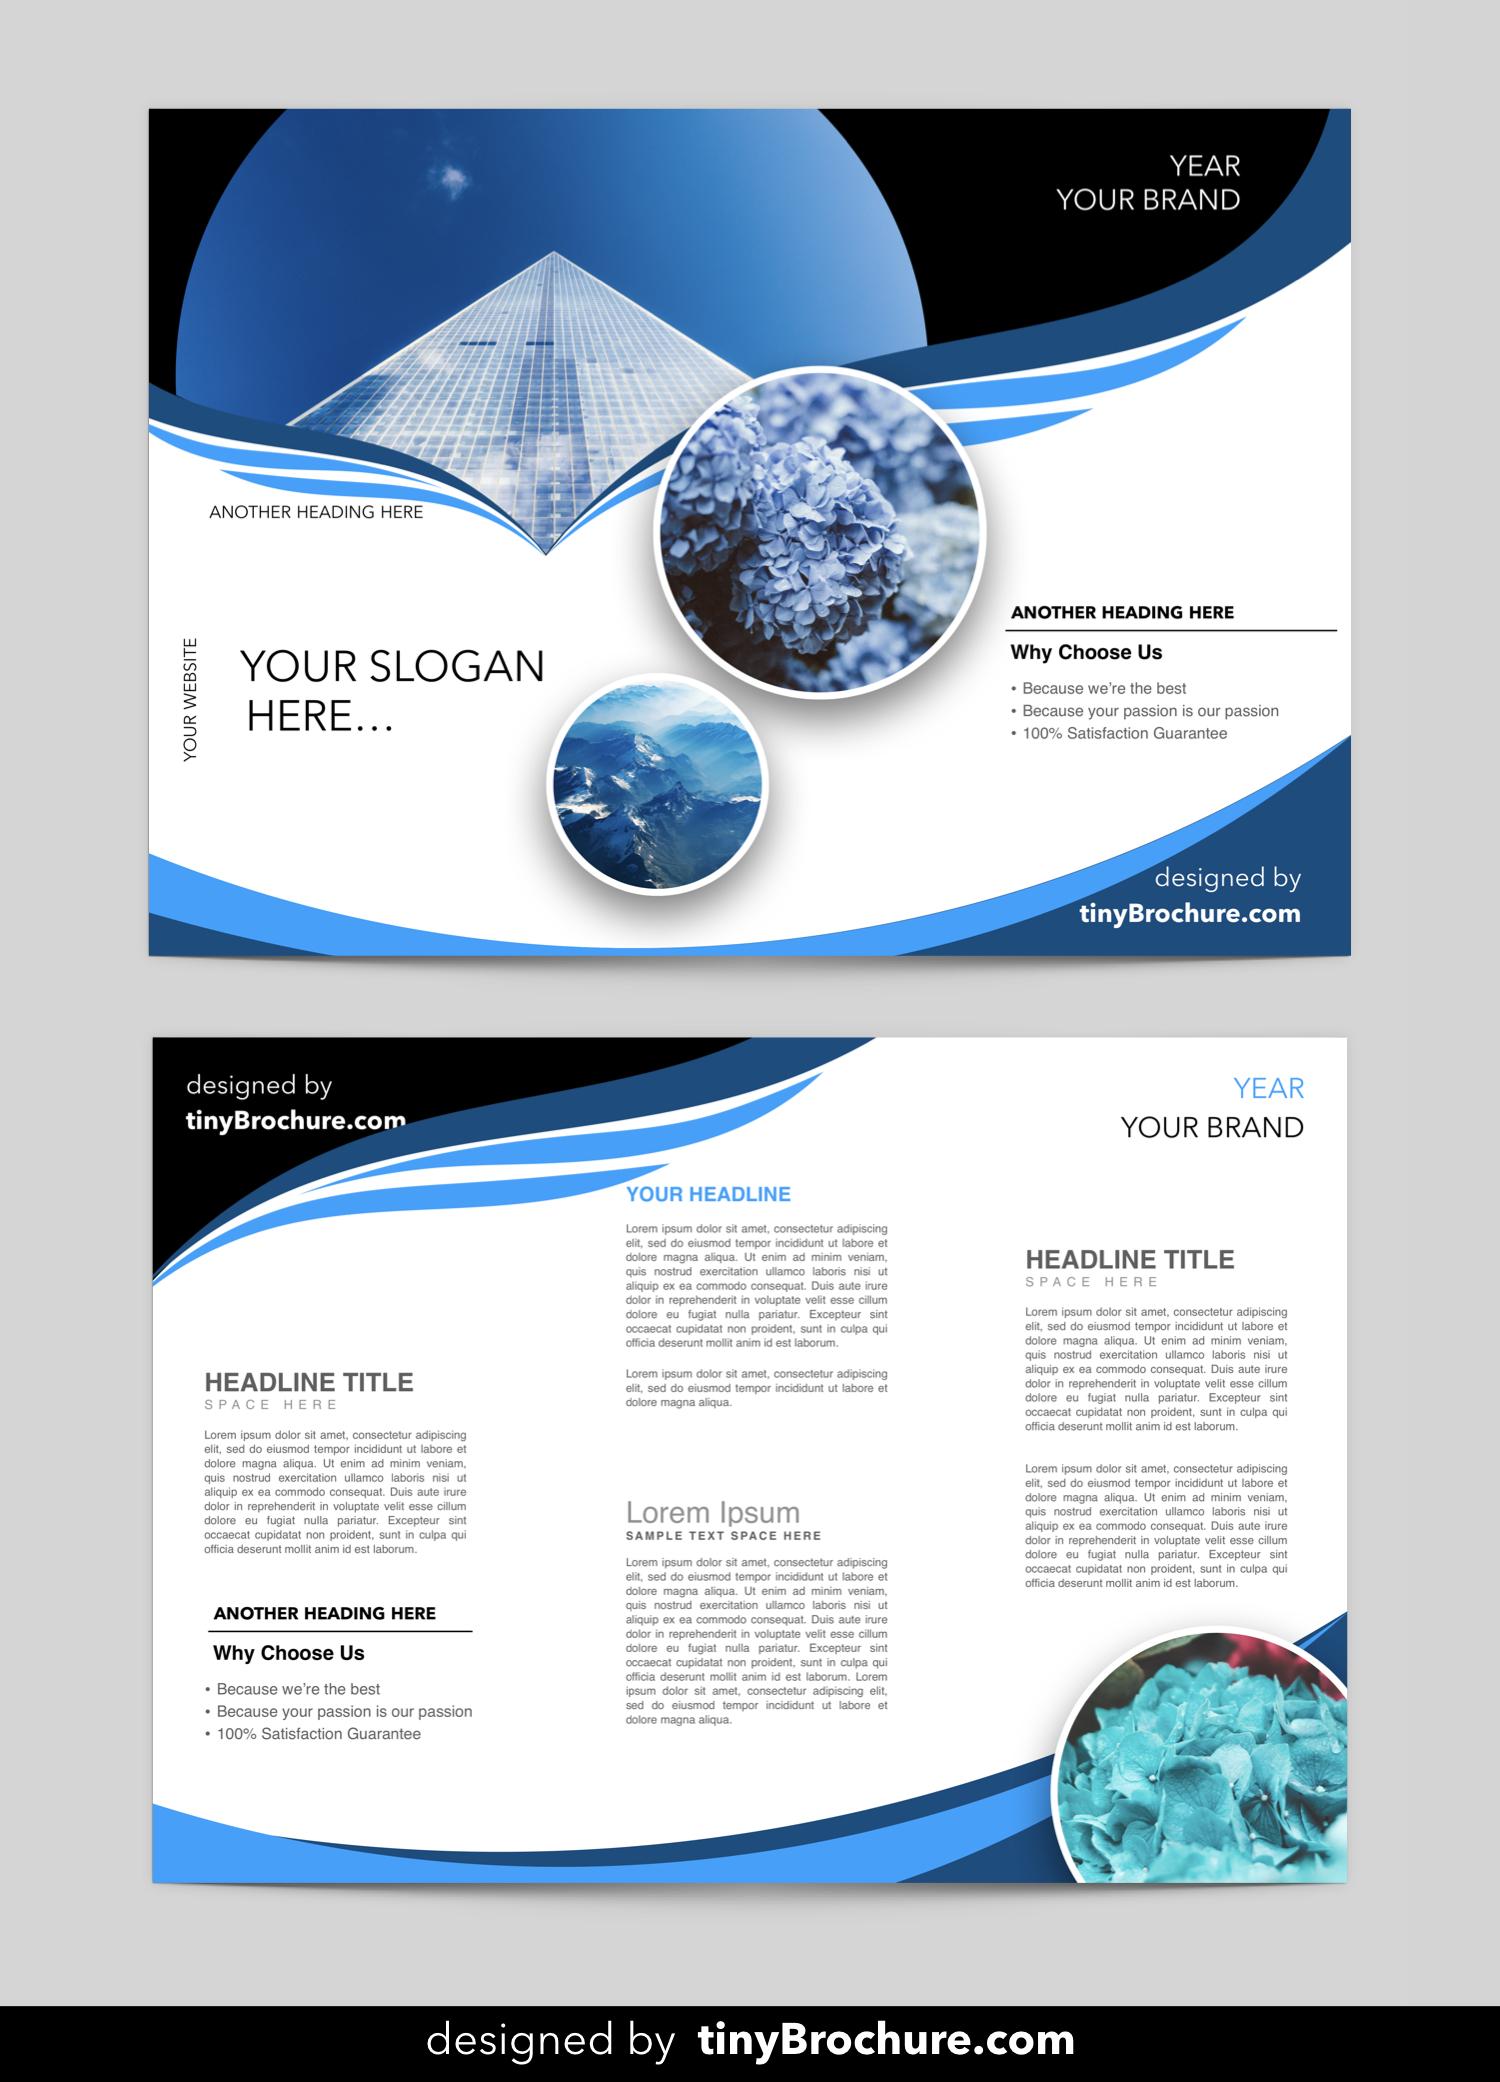 Editable Brochure Template Word Free Download | Brochure Pertaining To Brochure Templates For Word 2007